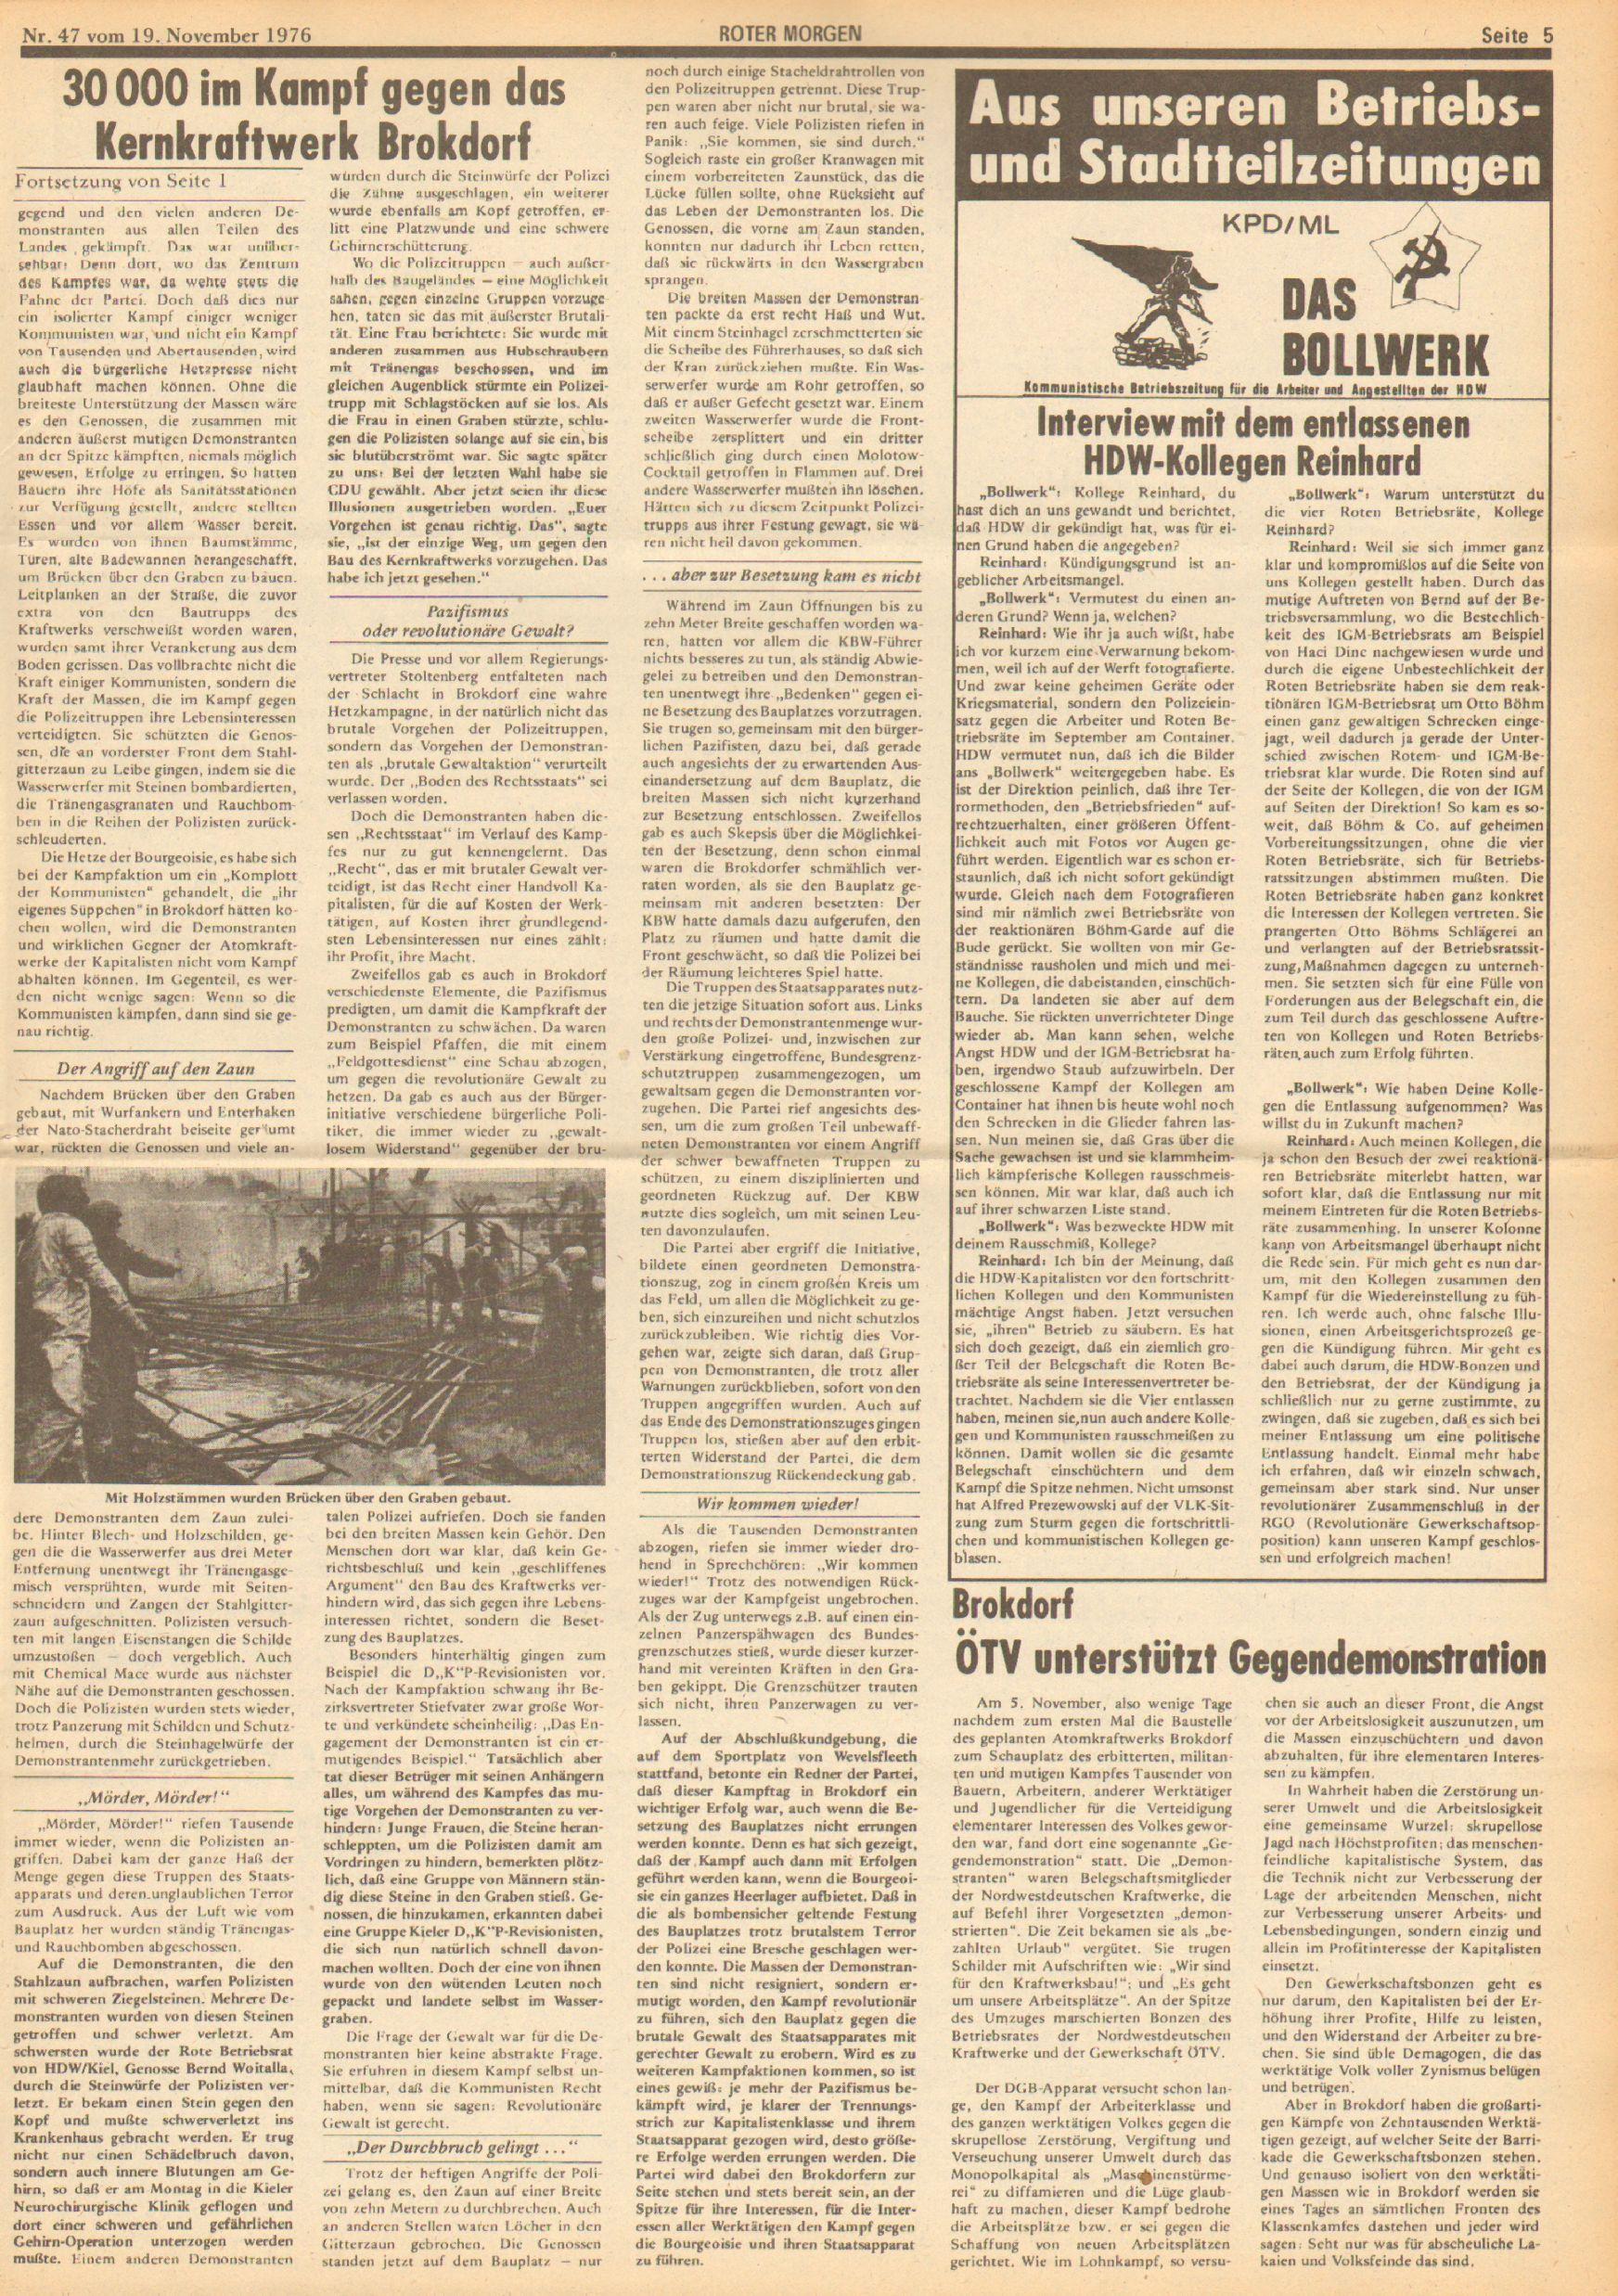 Roter Morgen, 10. Jg., 19. November 1976, Nr. 47, Seite 5